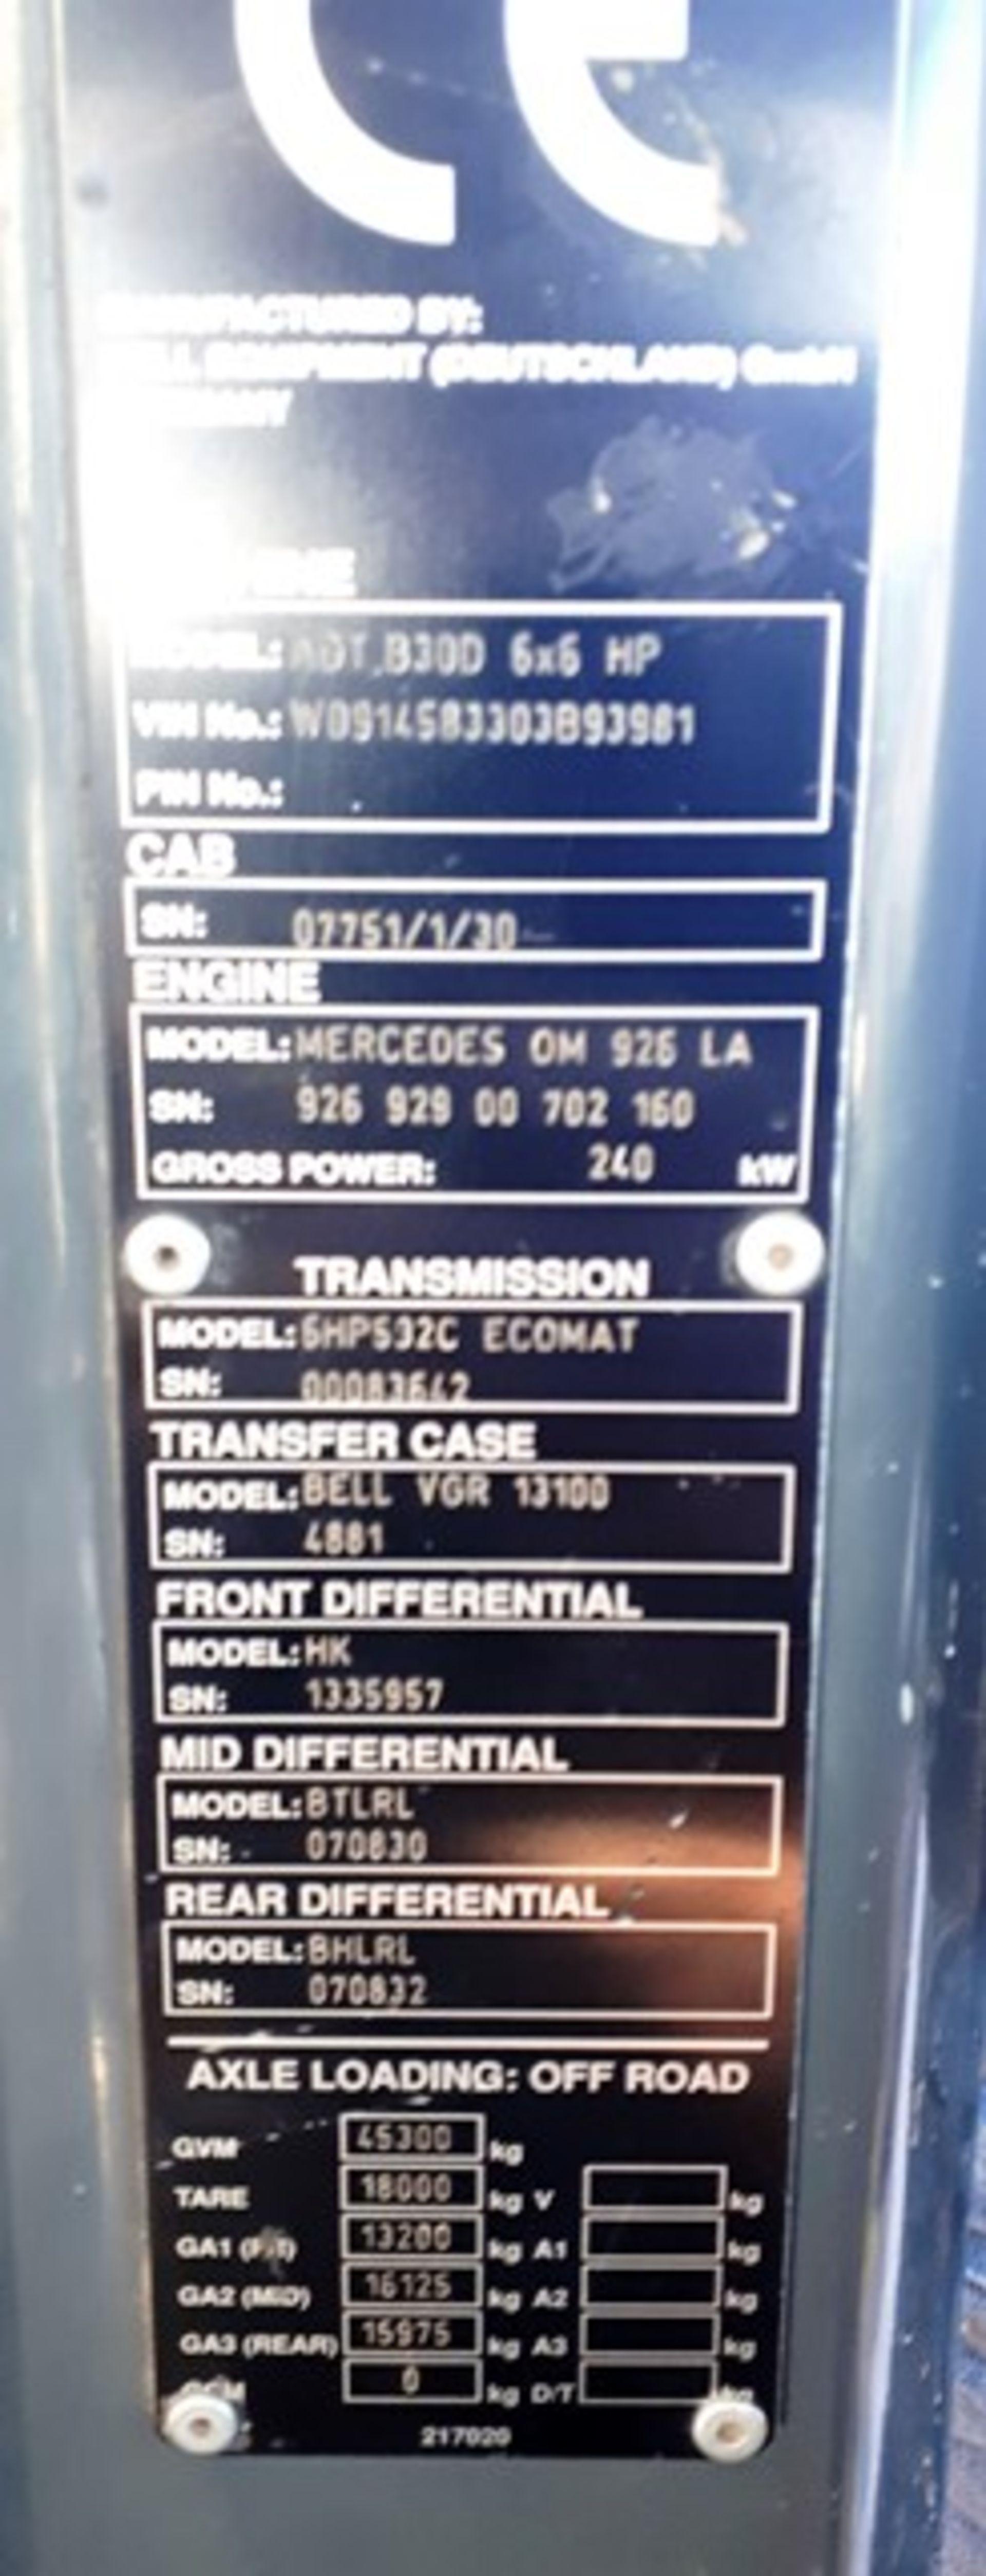 Auktionslos 833 - 2006 BELL ADT 30D 6X6 S/N926 929 00 702 160, 14630 hrs (not verified)